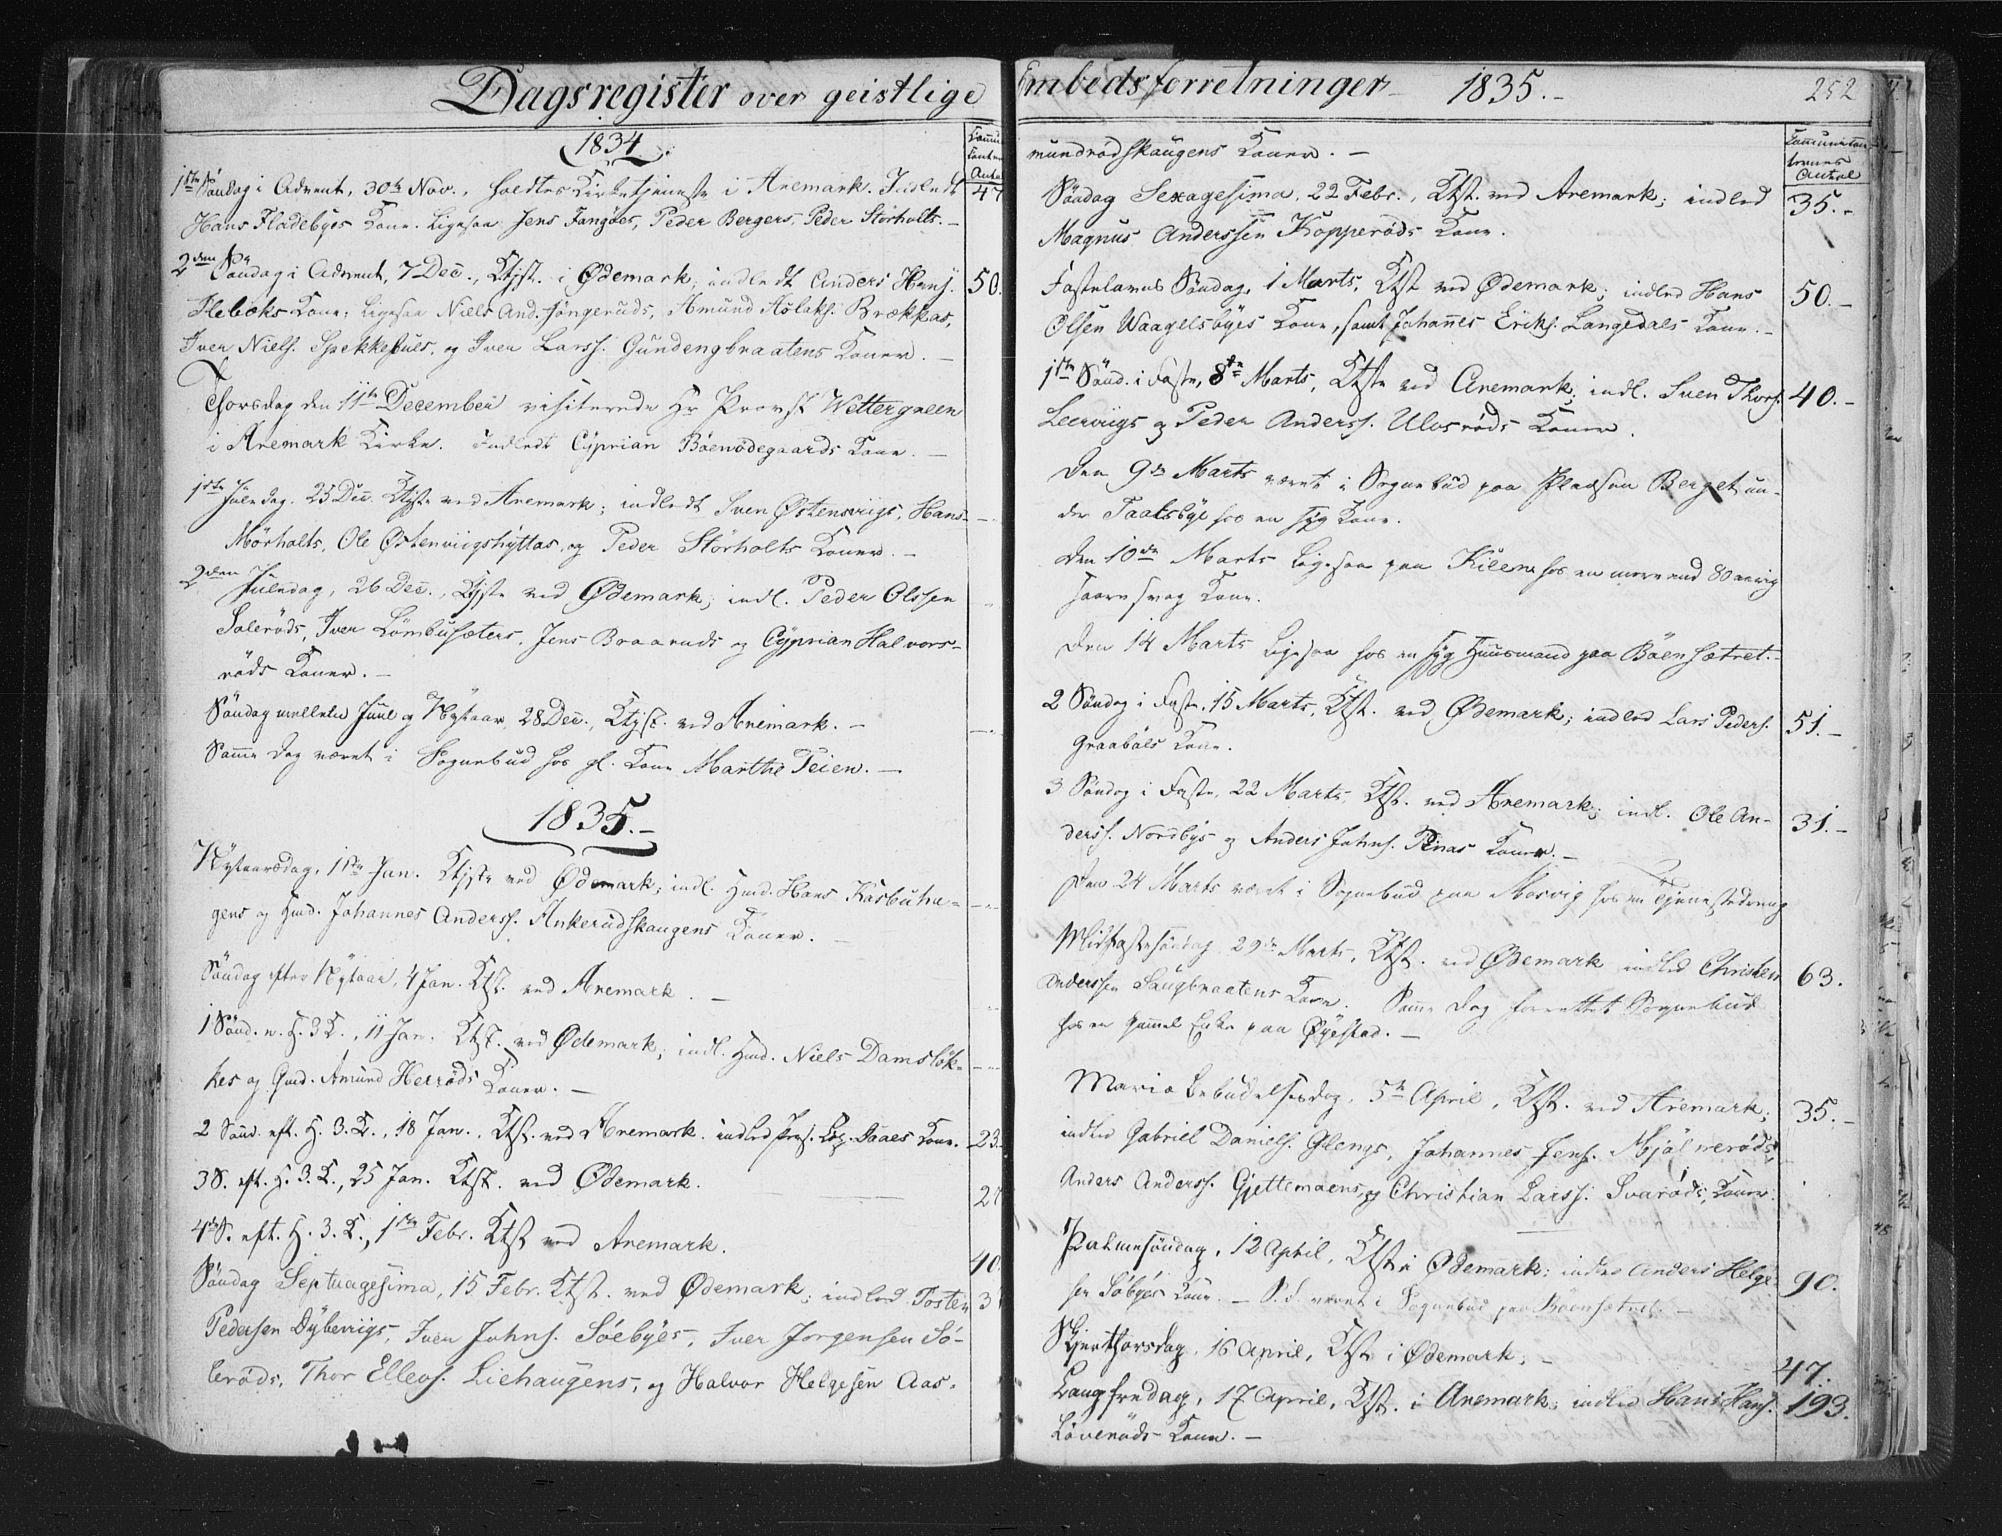 SAO, Aremark prestekontor Kirkebøker, F/Fc/L0002: Ministerialbok nr. III 2, 1834-1849, s. 252